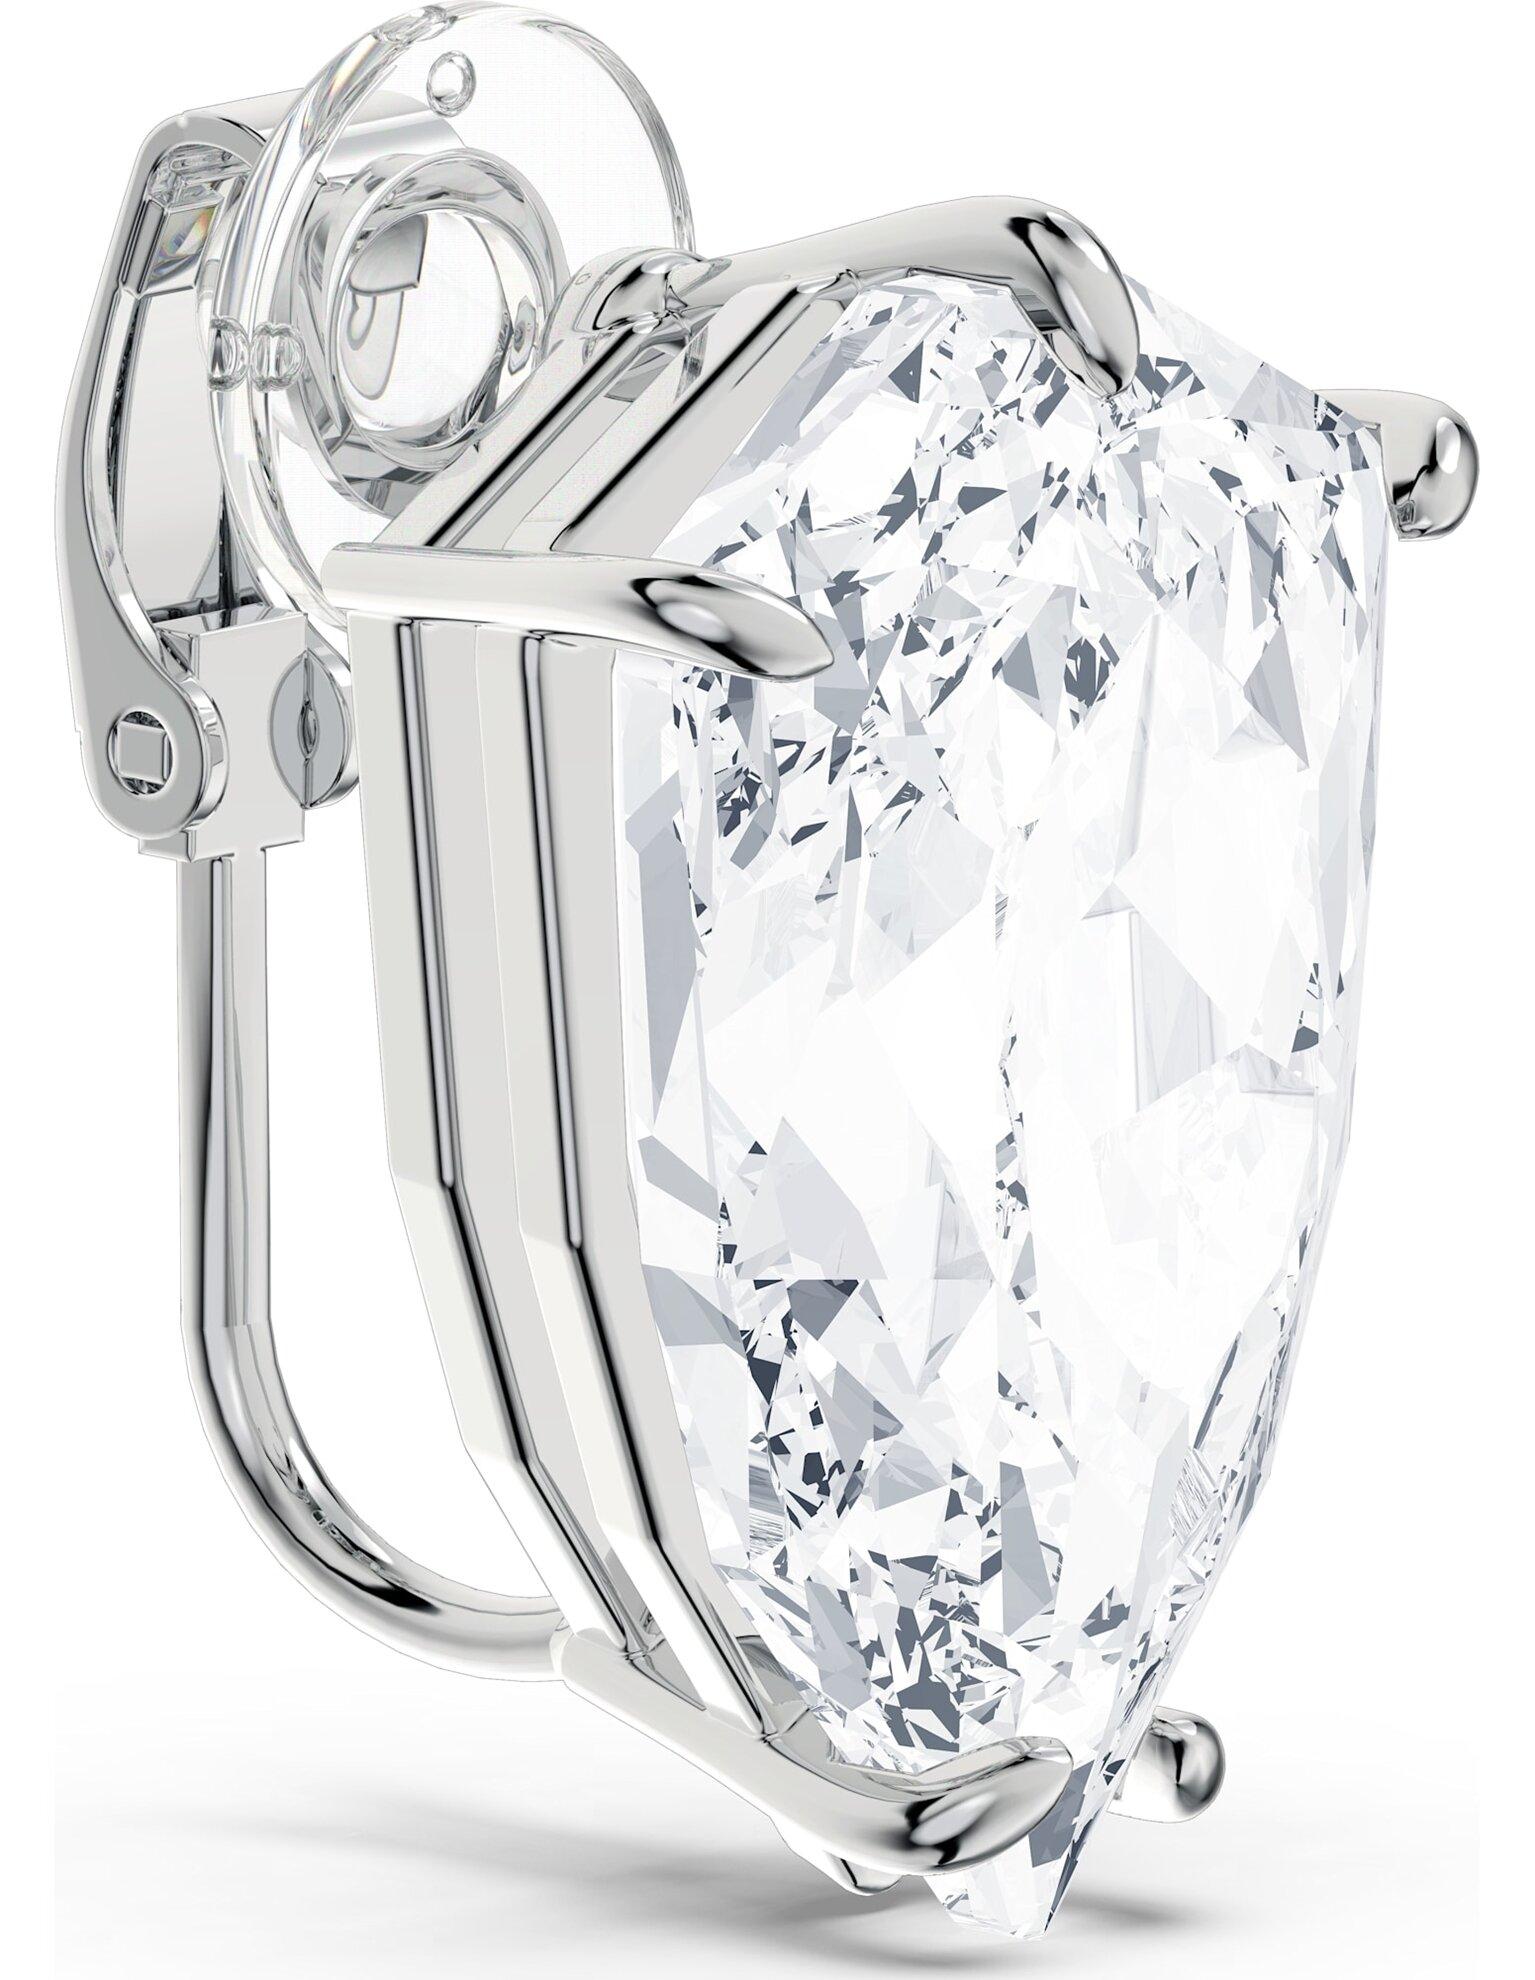 Picture of Mesmera Küpe, Trilliant kesim kristal, Beyaz, Rodyum kaplama